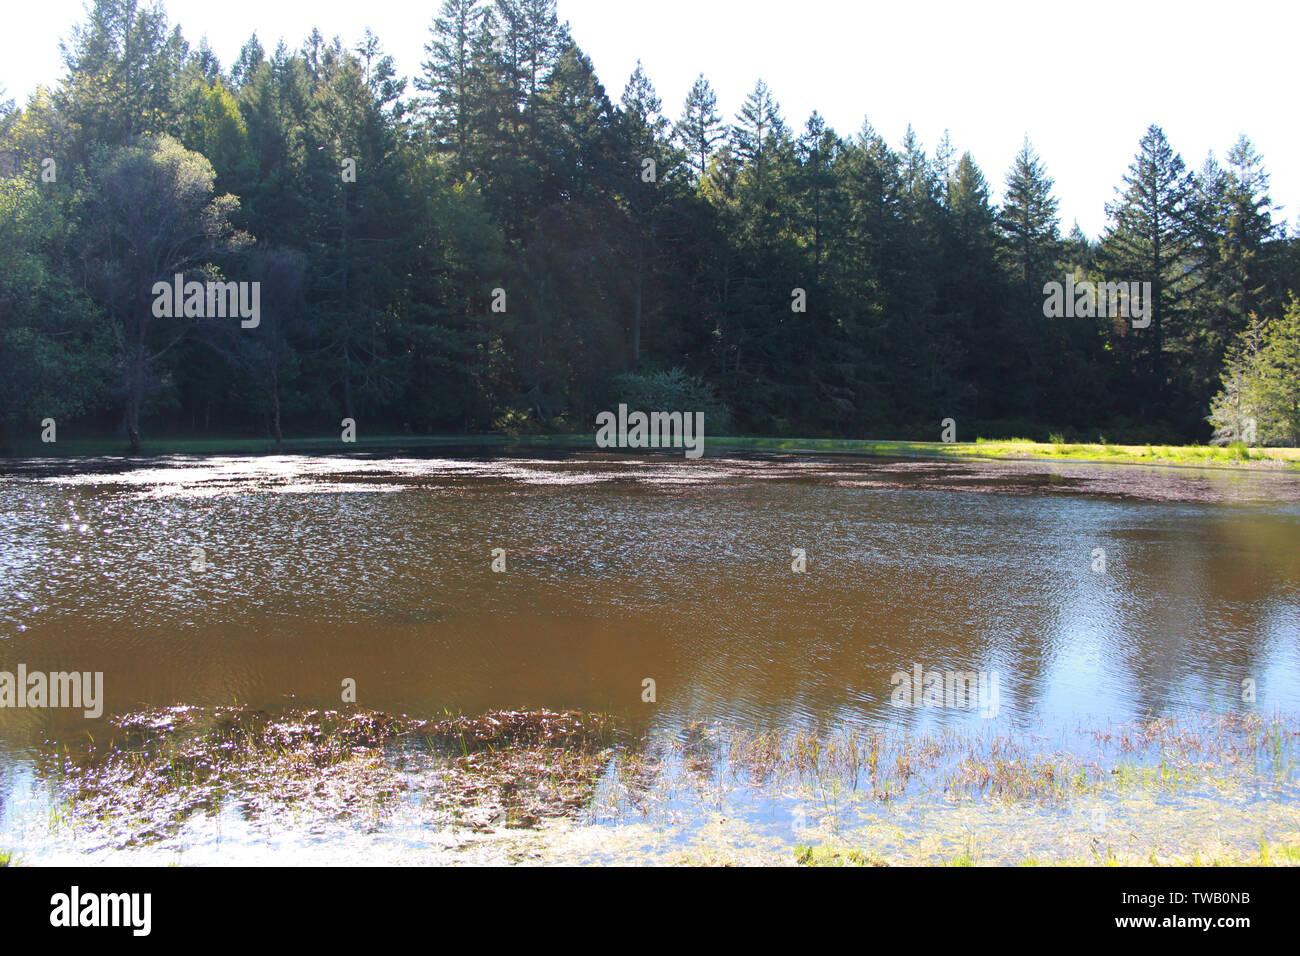 Scenic pond at Leggett, California - Stock Image